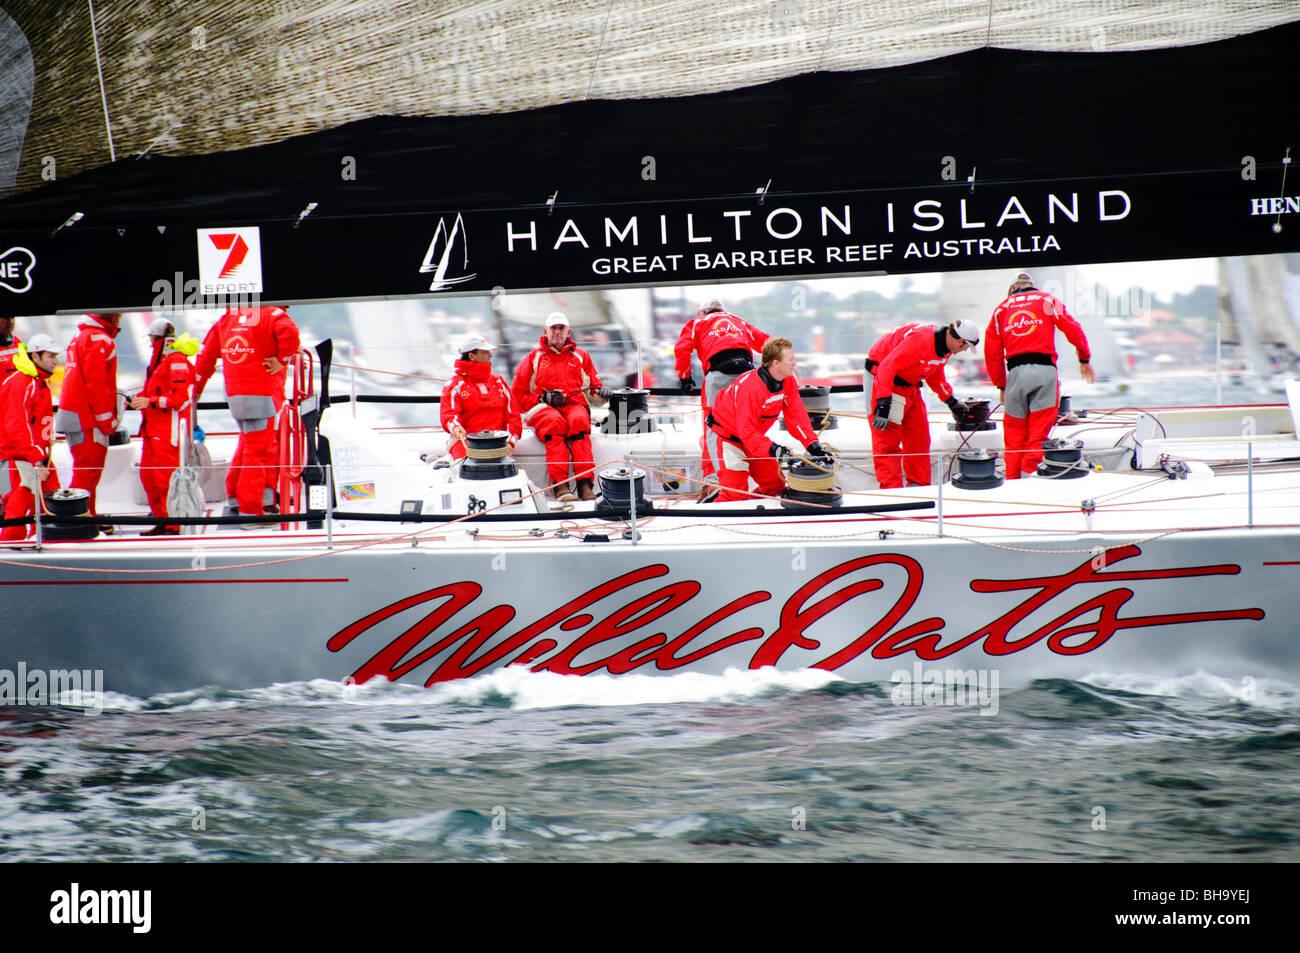 SYDNEY, Australia - SYDNEY, Australia - Super maxi yacht Wild Oats XI at the start of the 2009 Rolex Sydney to Harbour - Stock Image